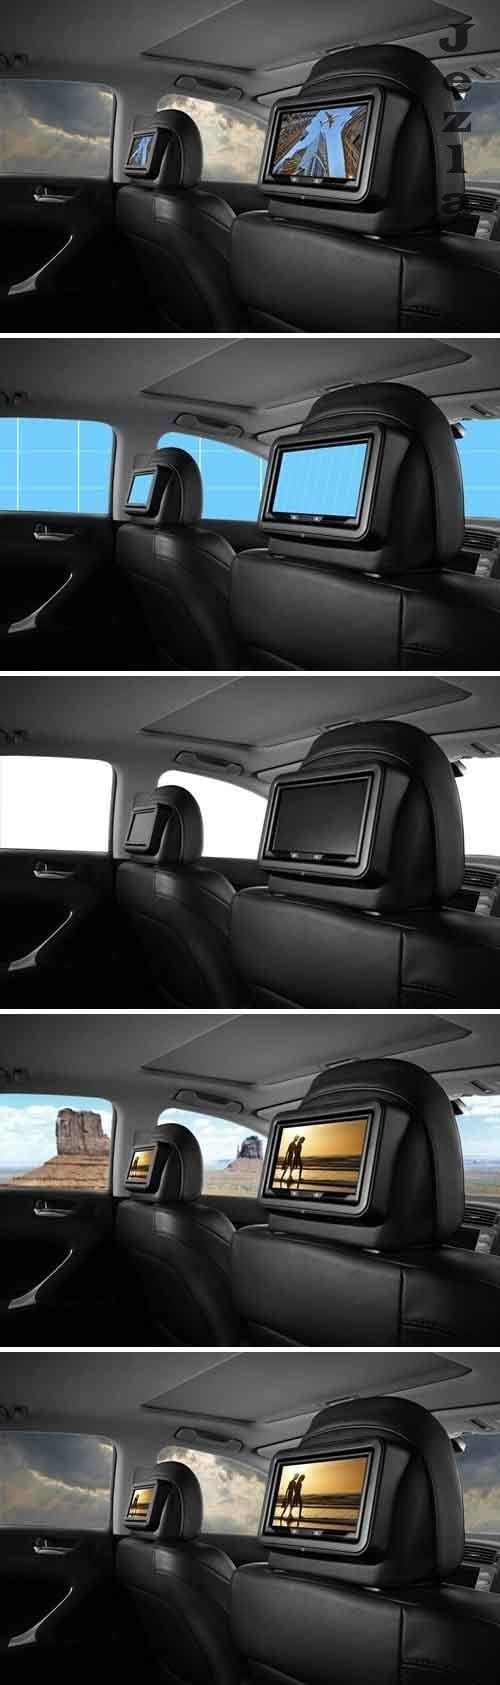 Leather interior-Car-Mockup - JVSM87A